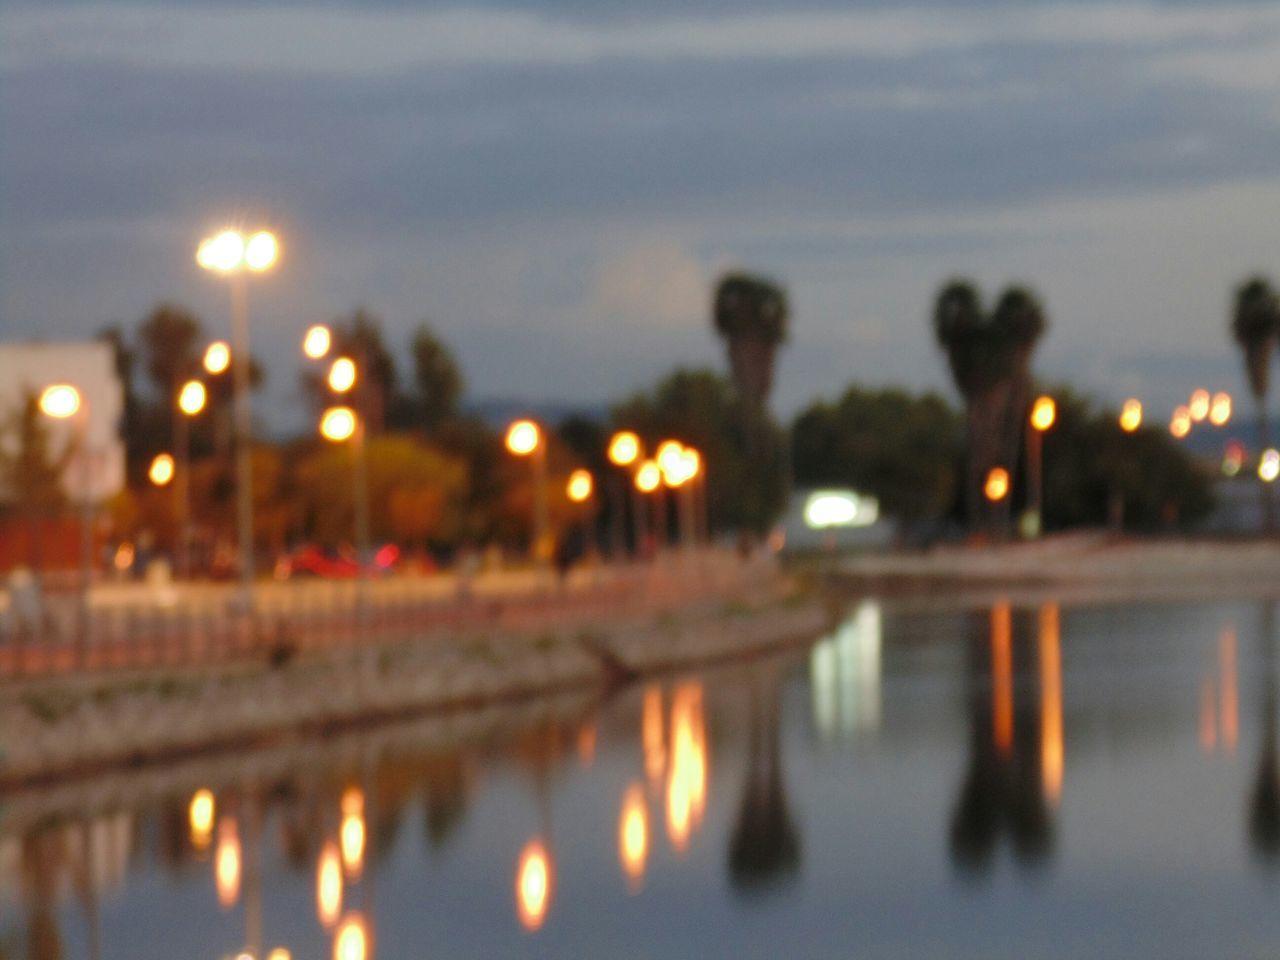 Glitch Night Lights Glitch Art EyeEm Best Shots - No Edit Moita EyeEm Gallery Cities At Night